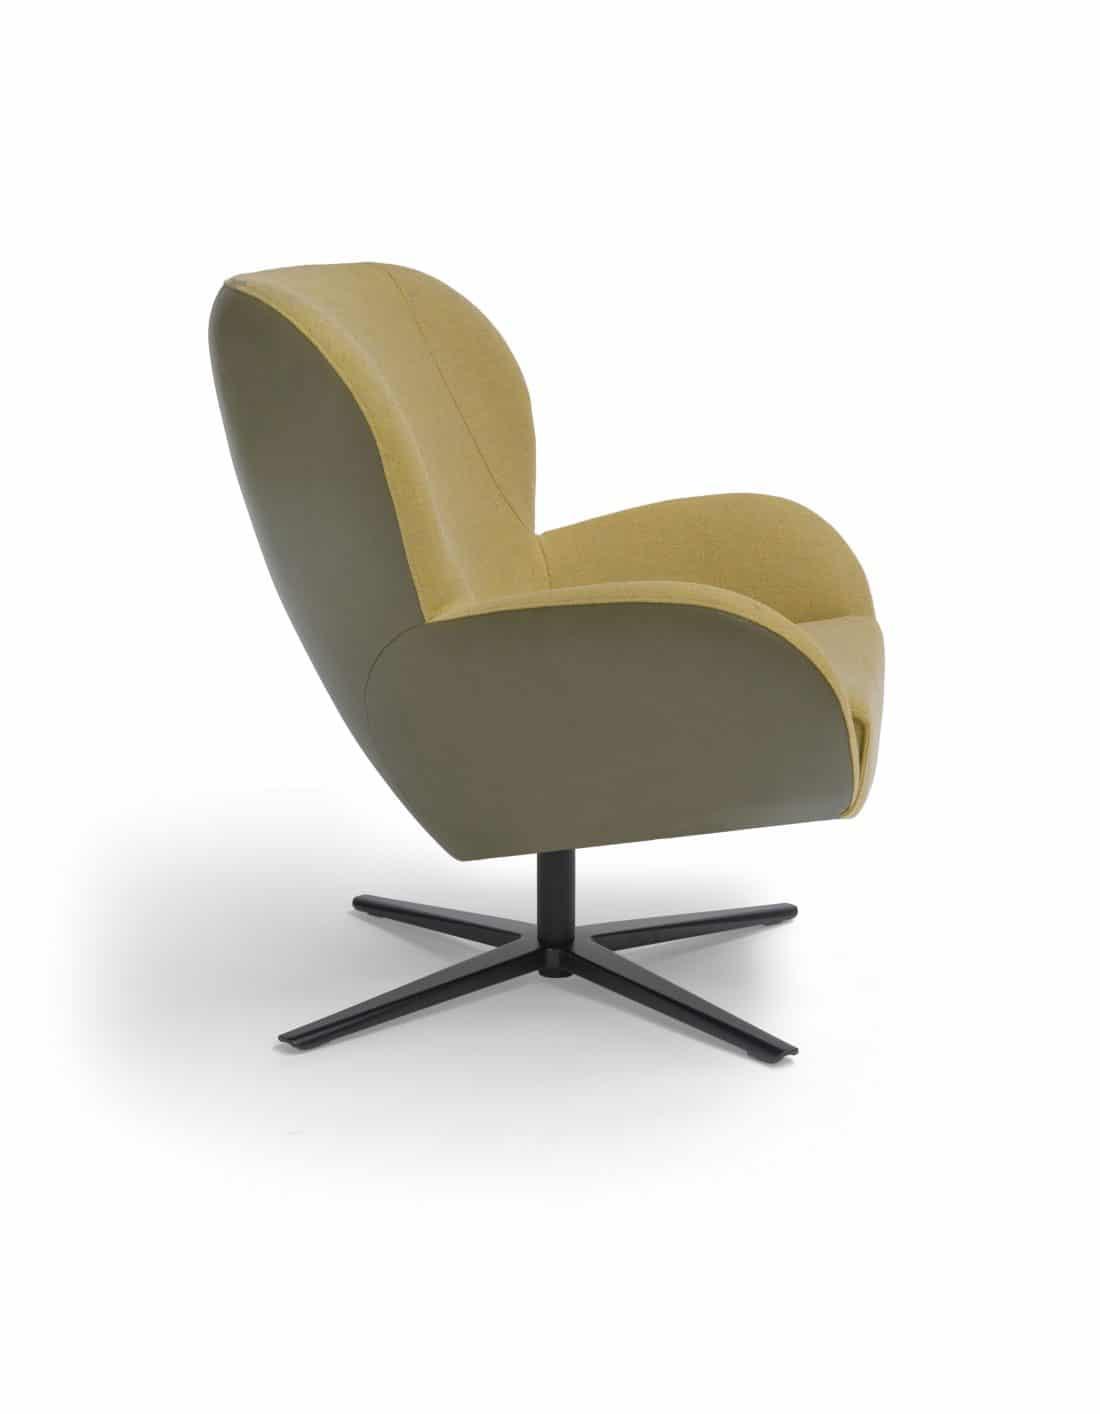 Legendary Draaifauteuil Leder Lucca Pine Stof Ploegwool Geel Design Fauteuil Scaled